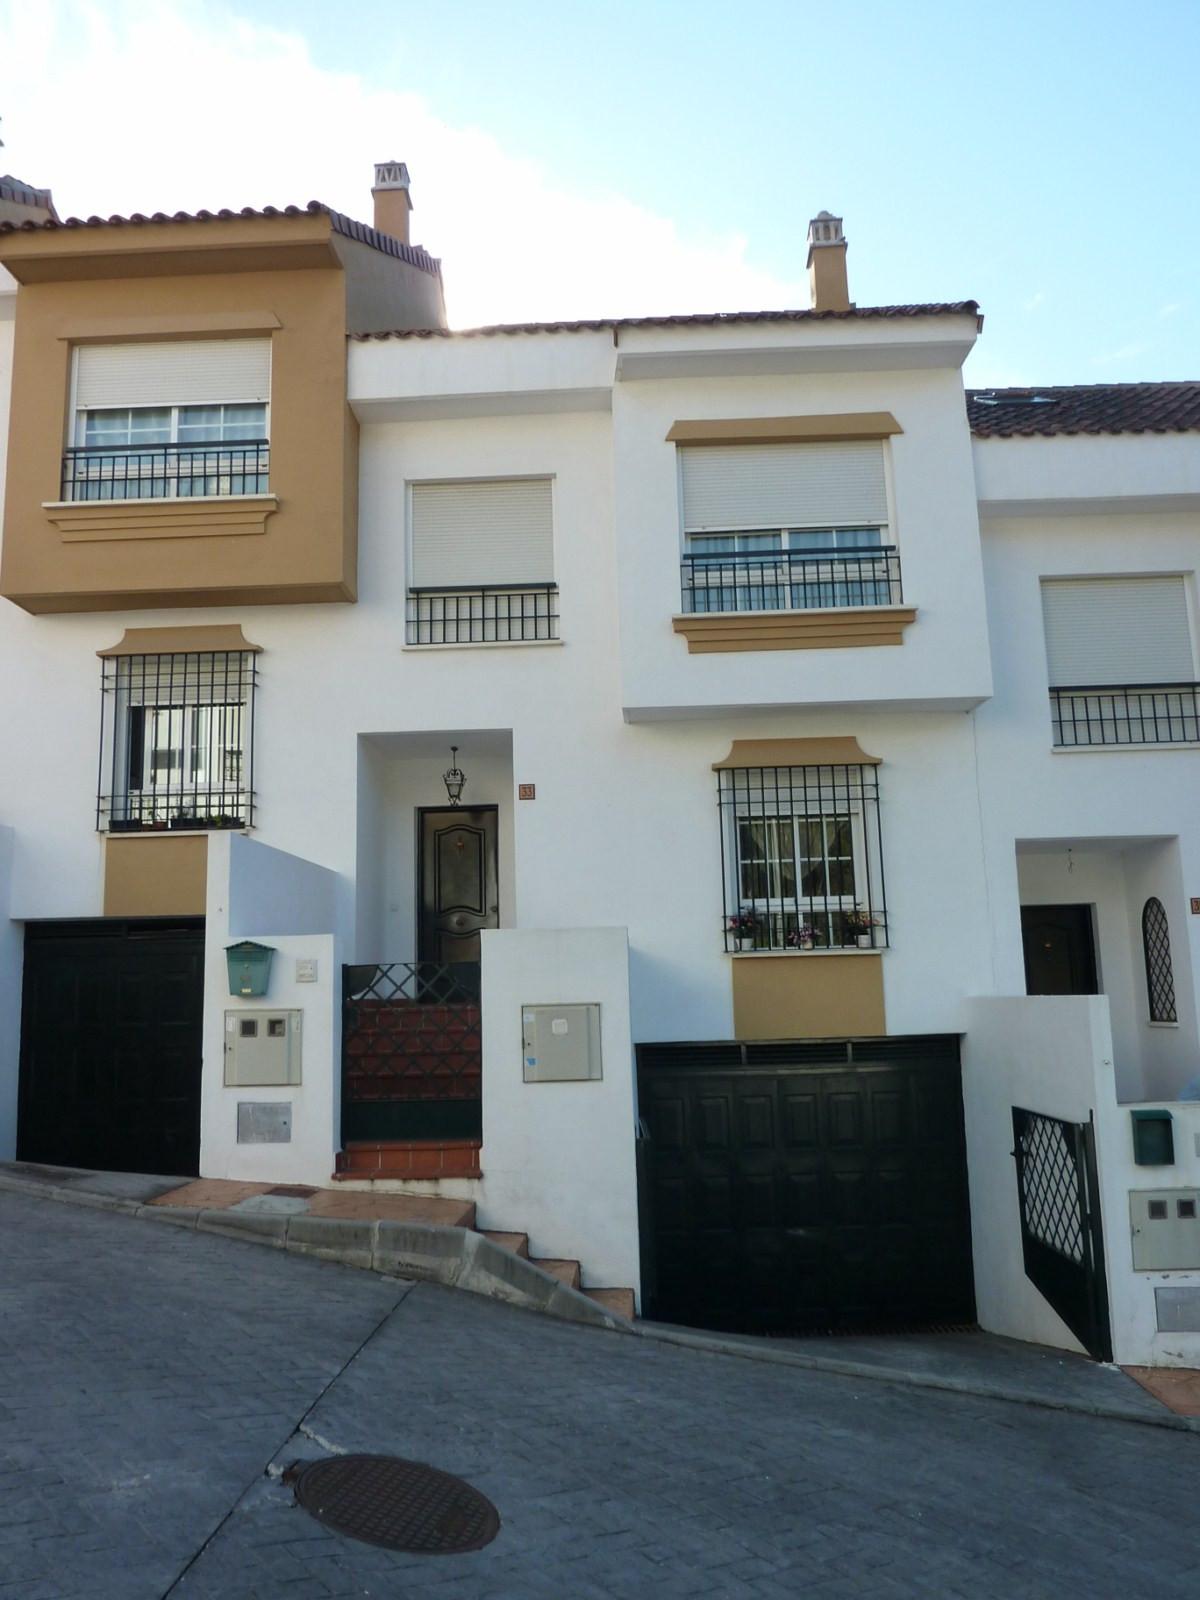 Townhouse  Terraced for sale   in Benalmadena Costa